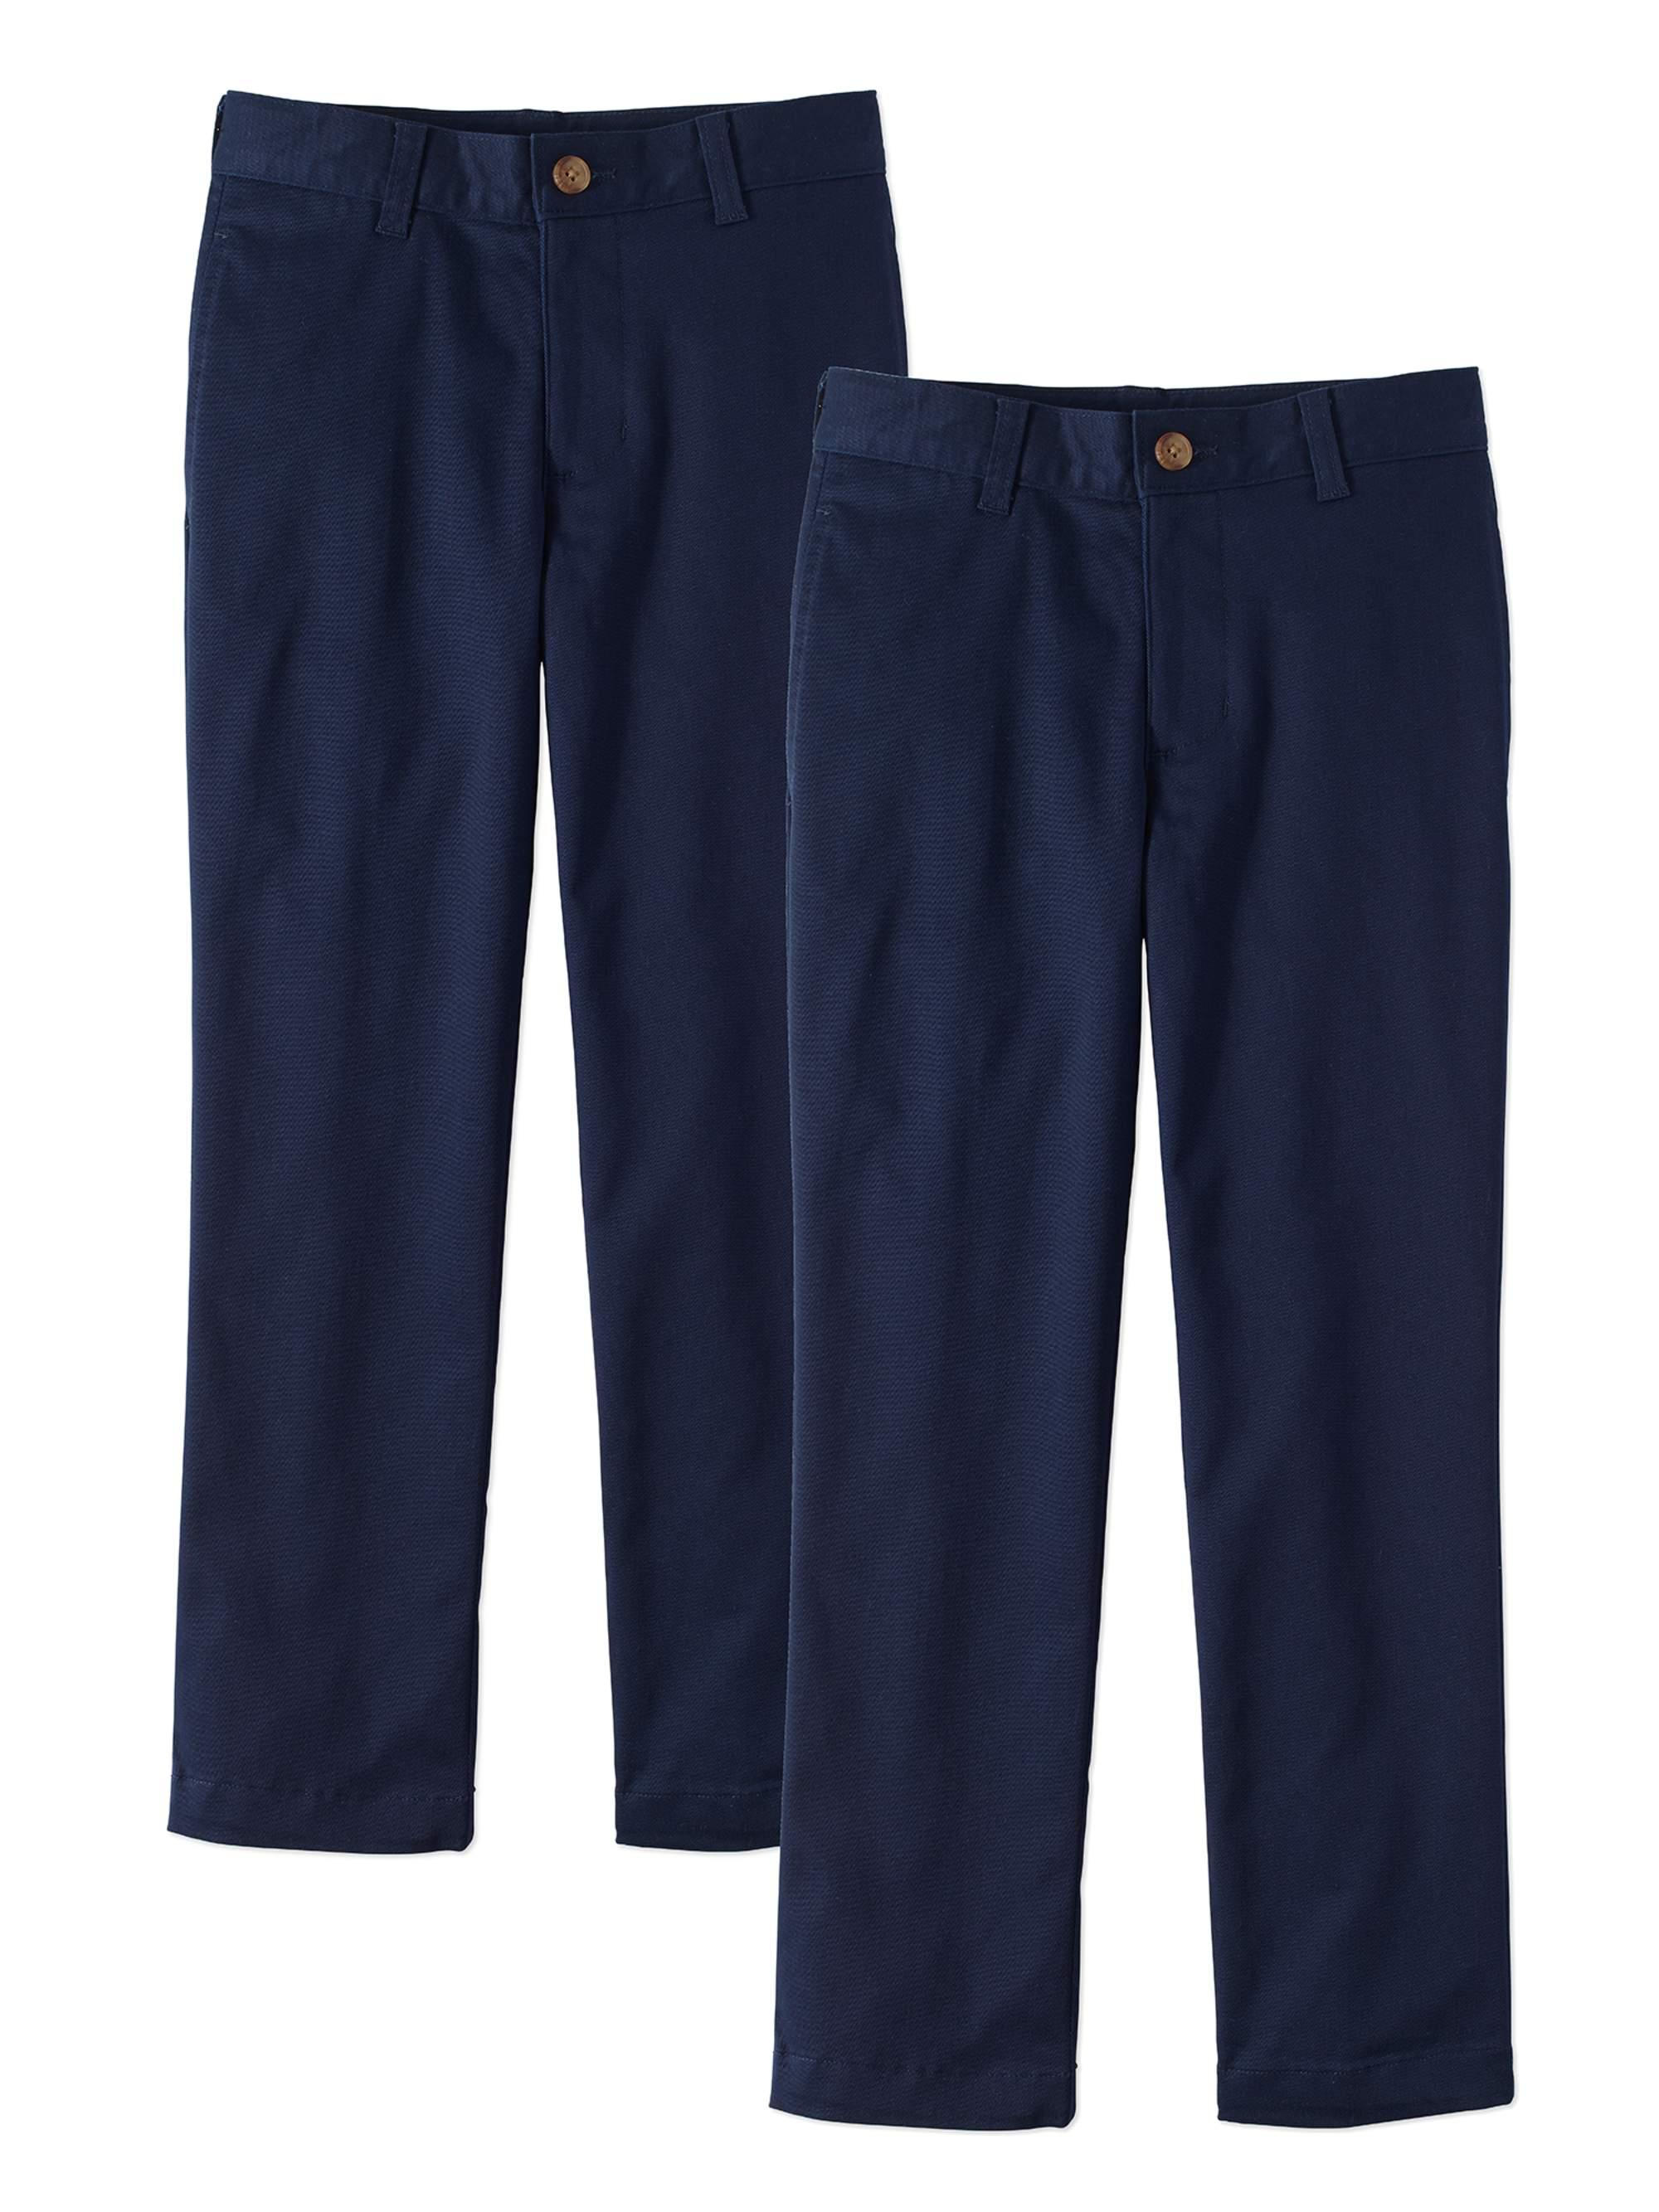 Wonder Nation Boys School Uniform Super Soft Flat Front Pants, 2-Pack Value Bundle